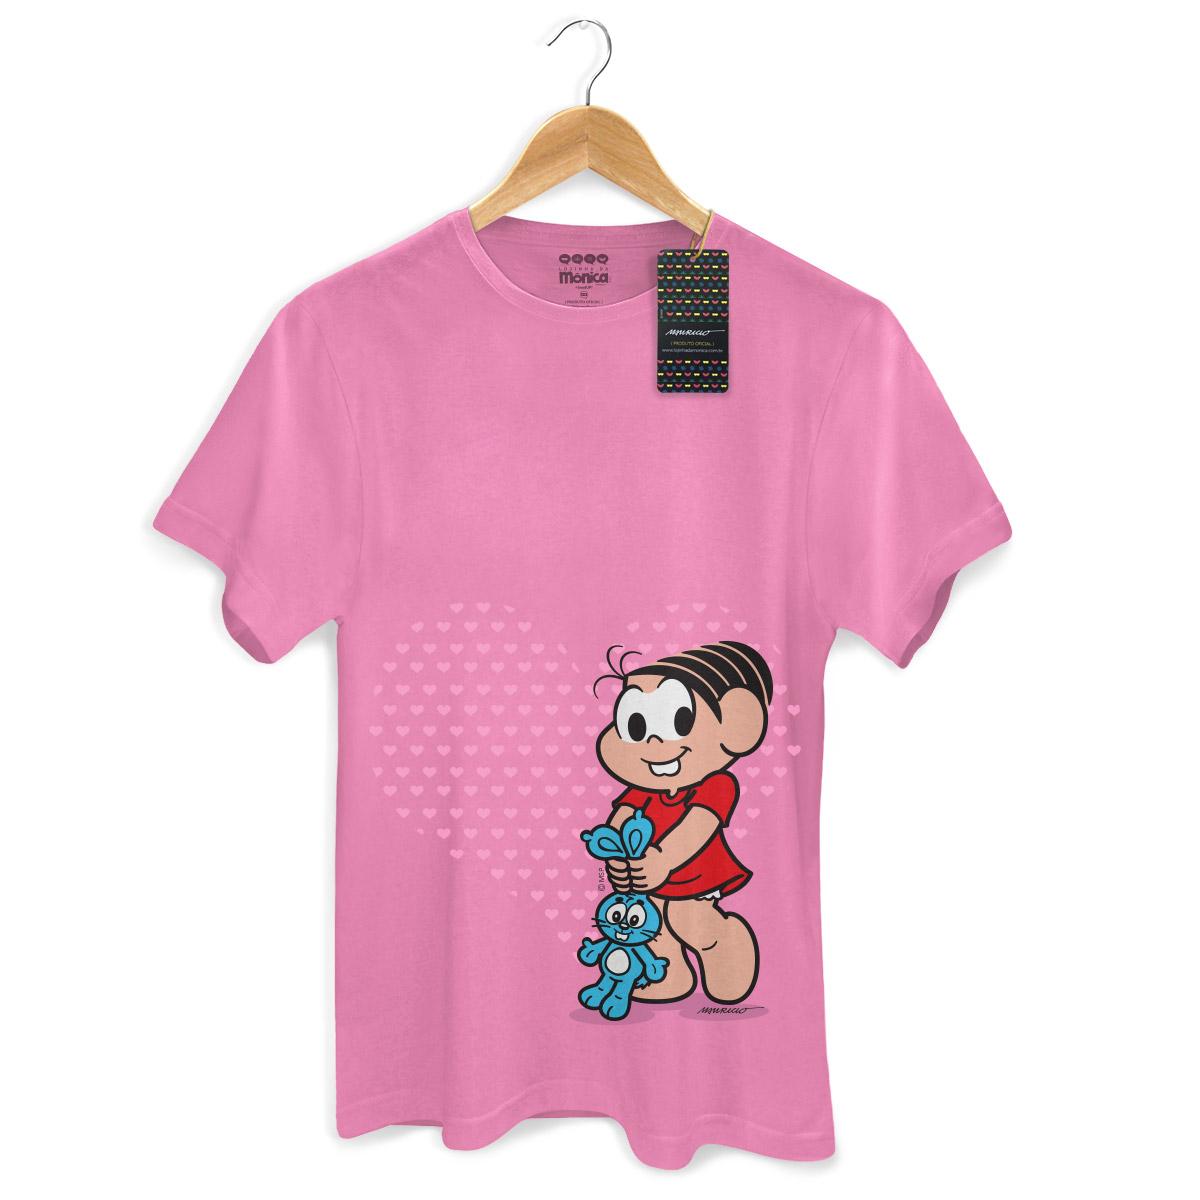 Camiseta Masculina Turma Da M�nica Kids M�nica Heart